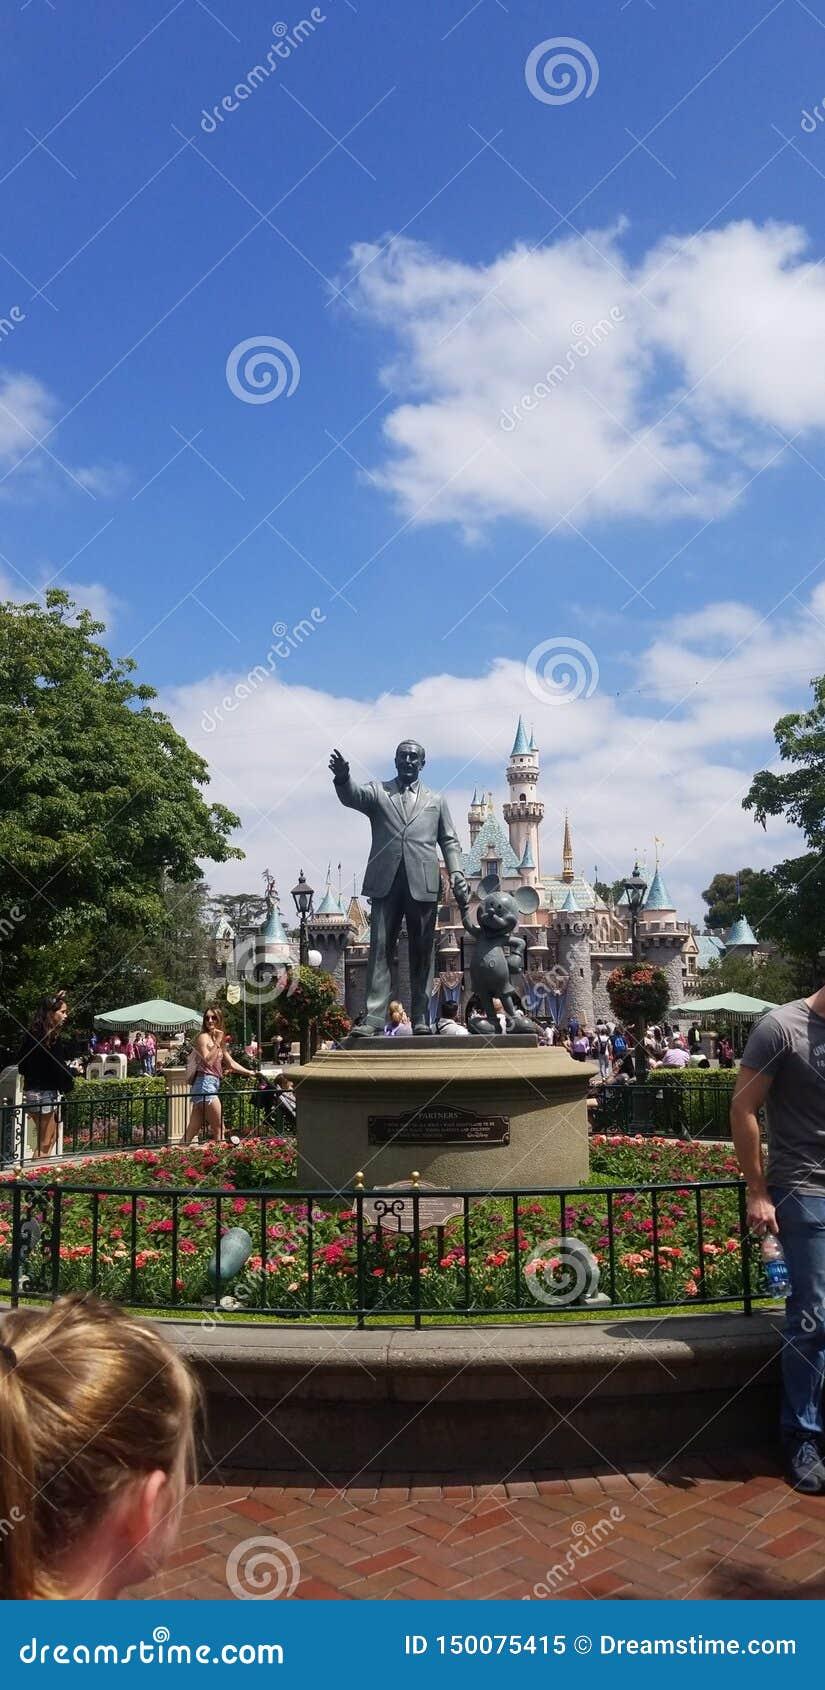 Meeting Walt Disney